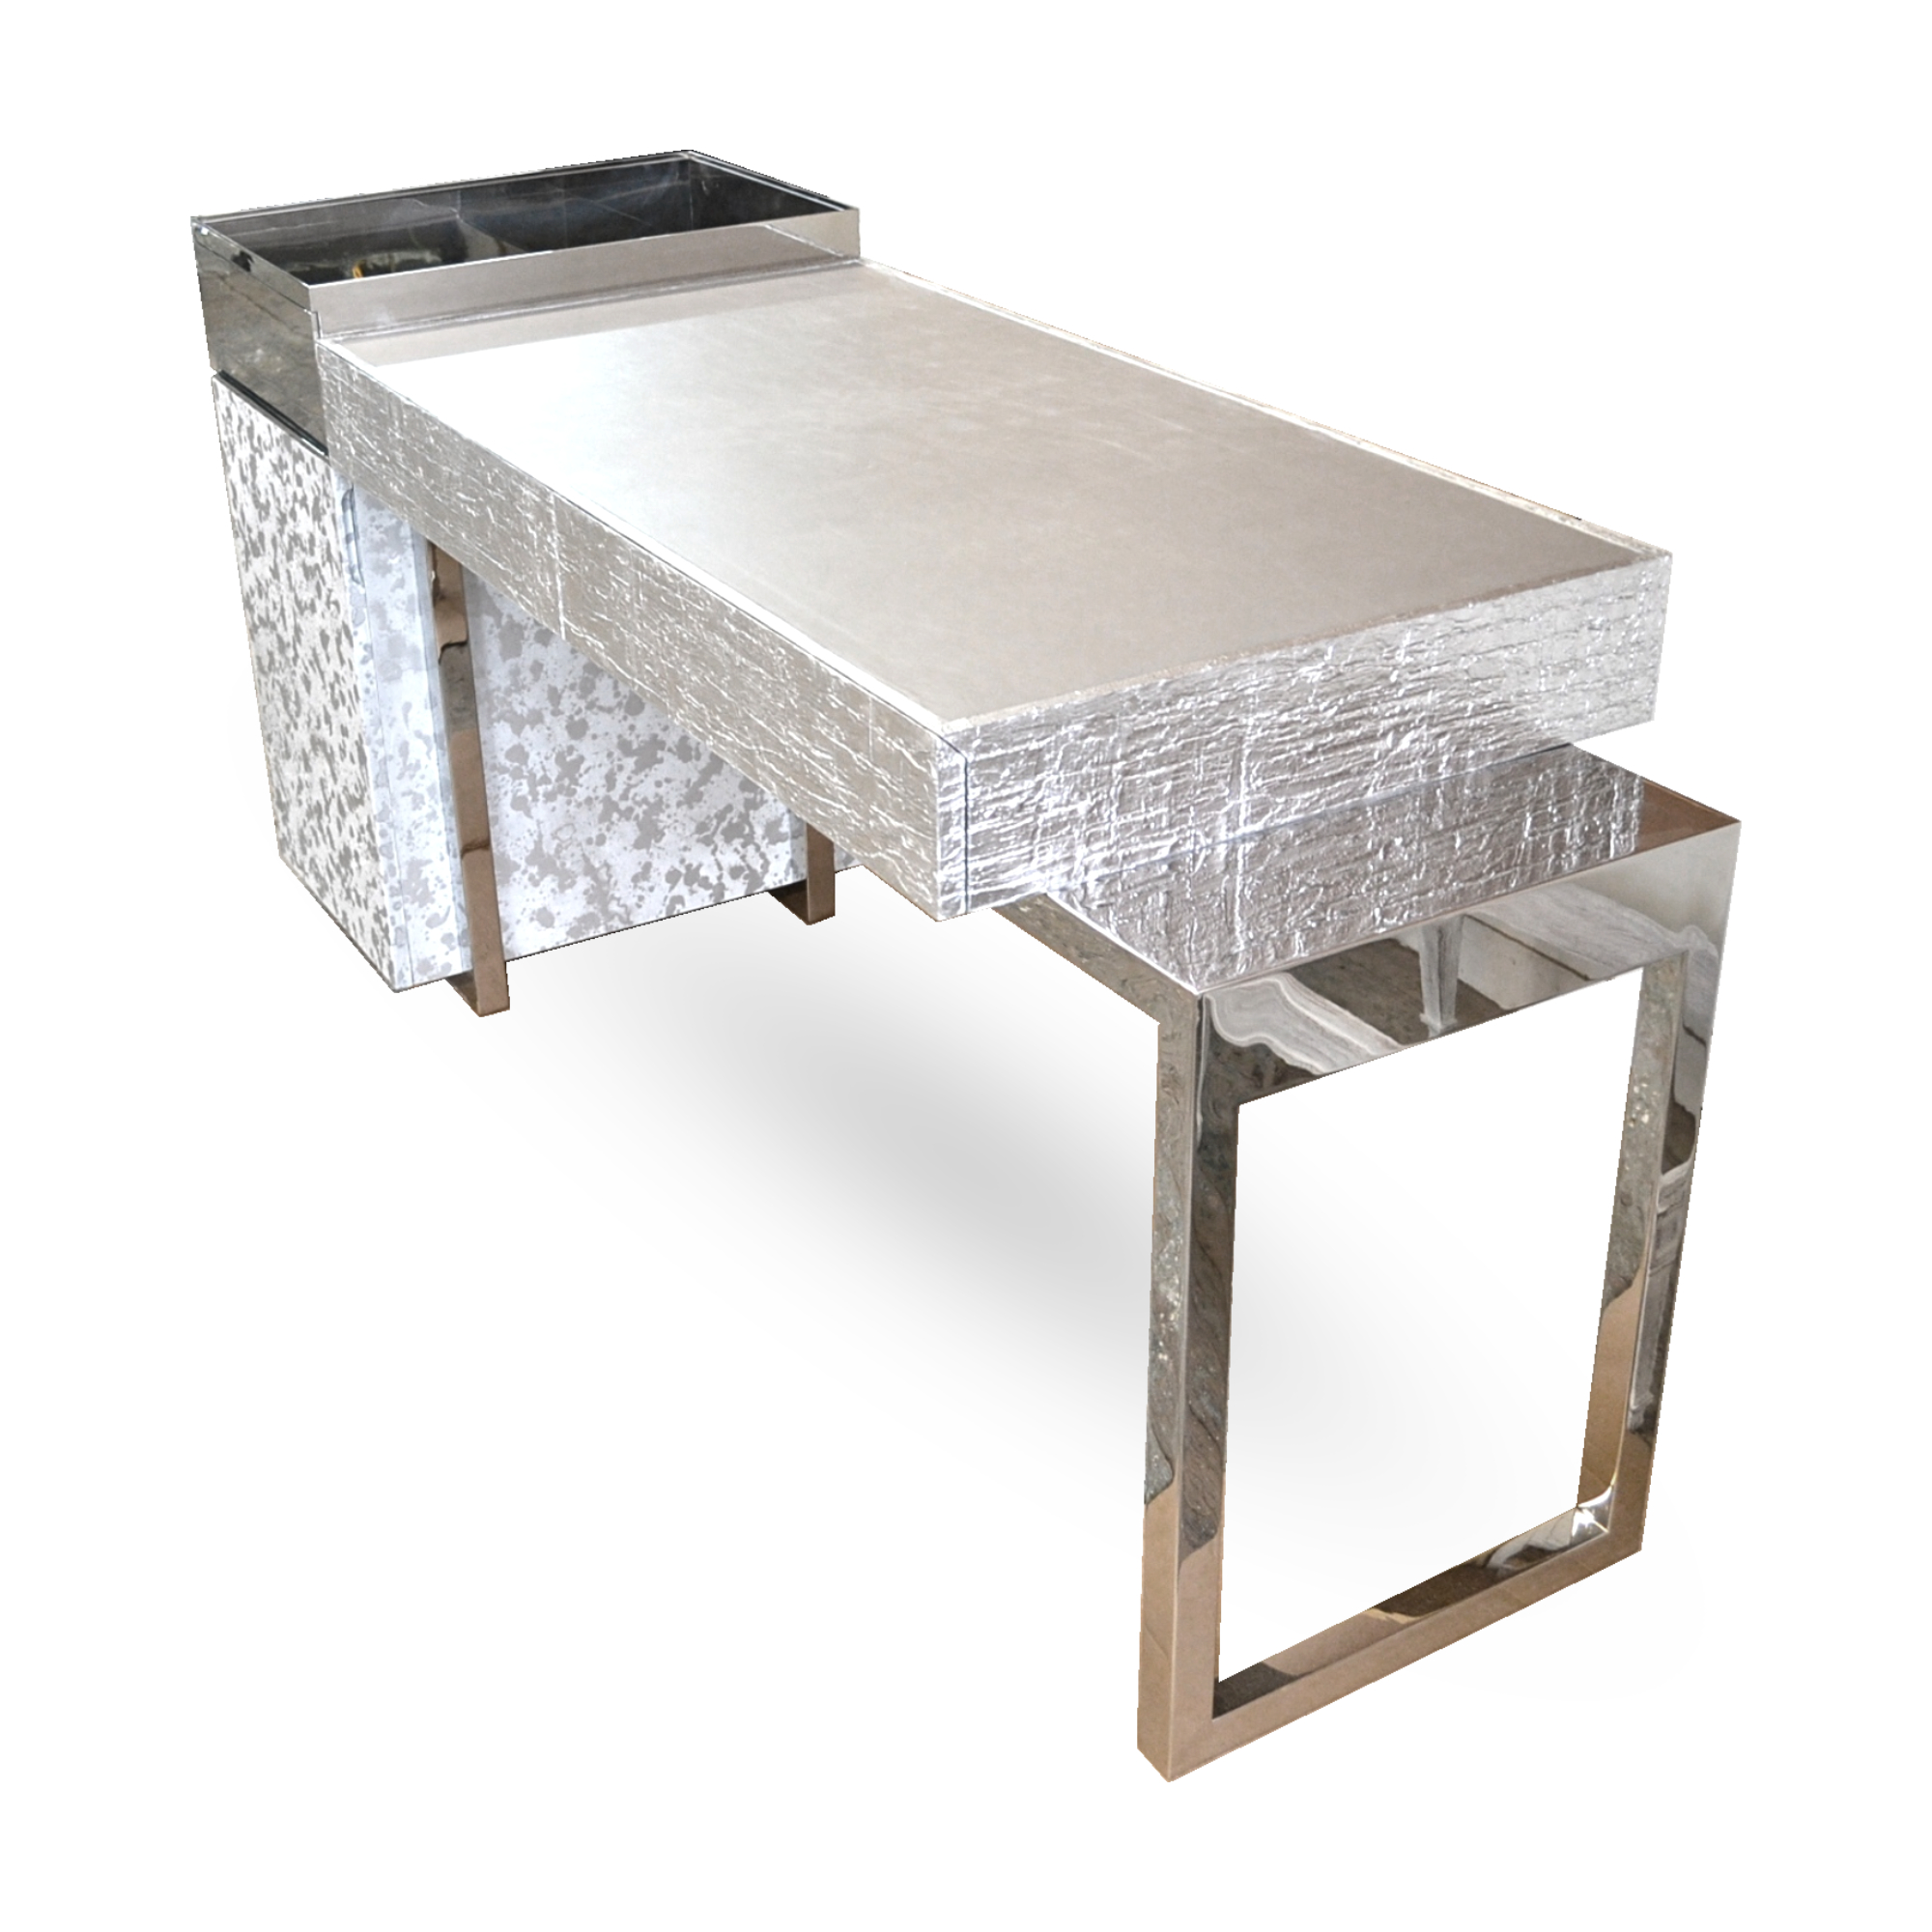 Dior-Desk-Silver.jpg